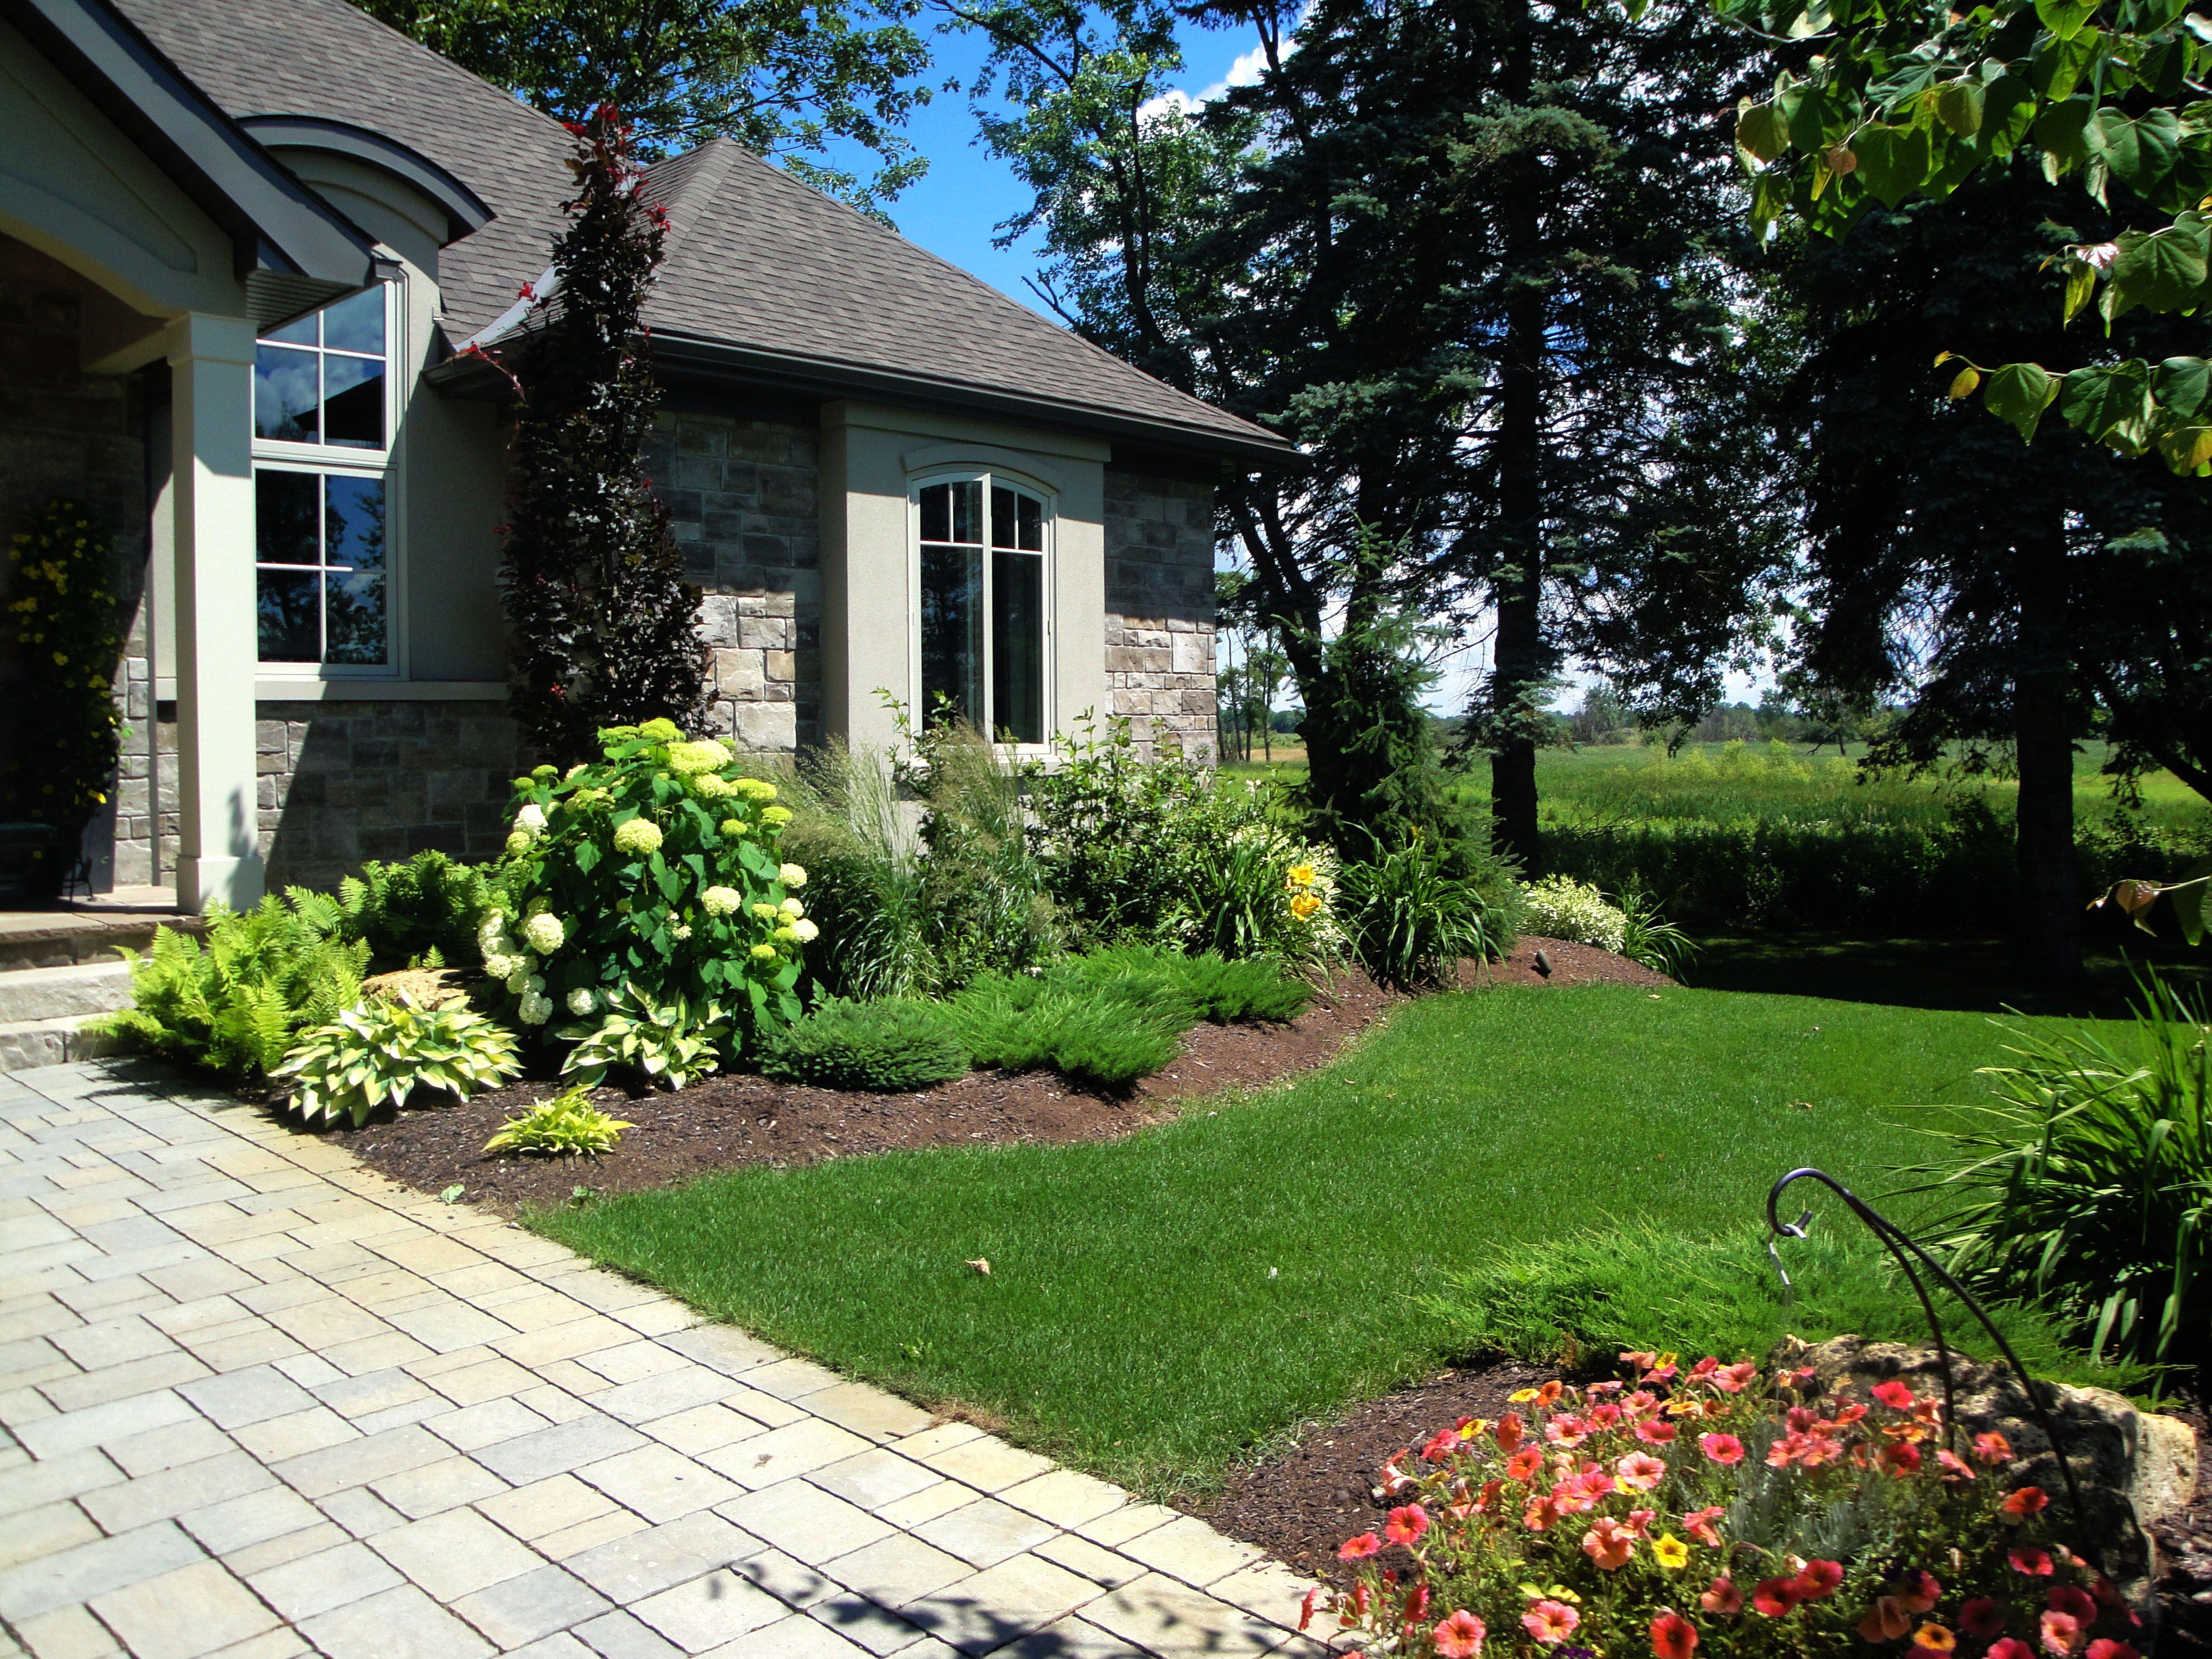 Hydrangeas, junipers, hostas, ferns, and grass in a front ...